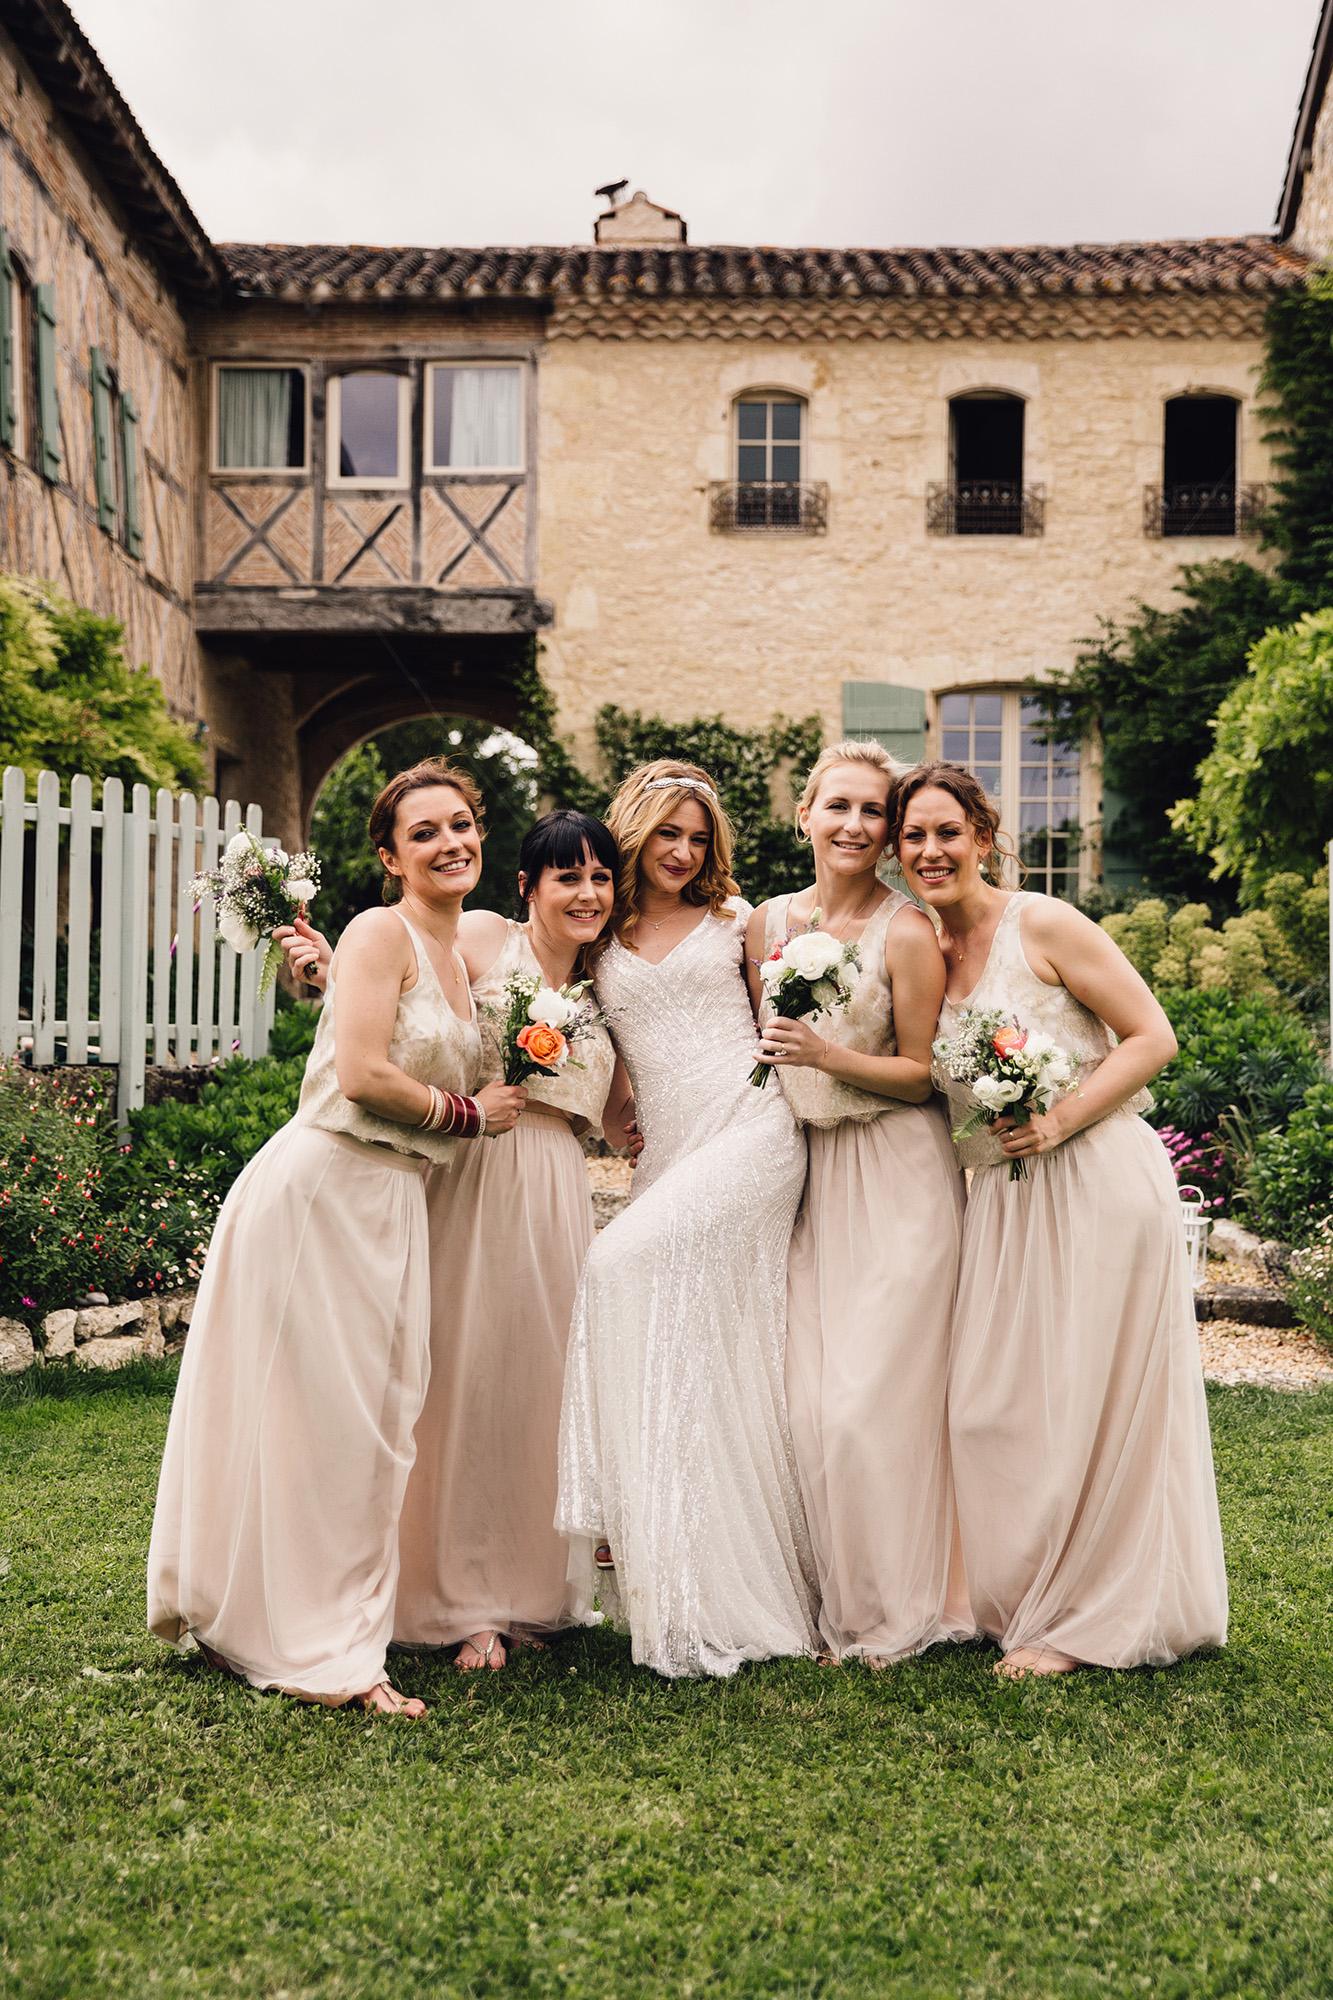 Hannah-Bespoke-Bridesmaids-Bohemian-French-Wedding-Gold-Lace-Susanna-Greening-Designs-Matlock-Derbyshire-18